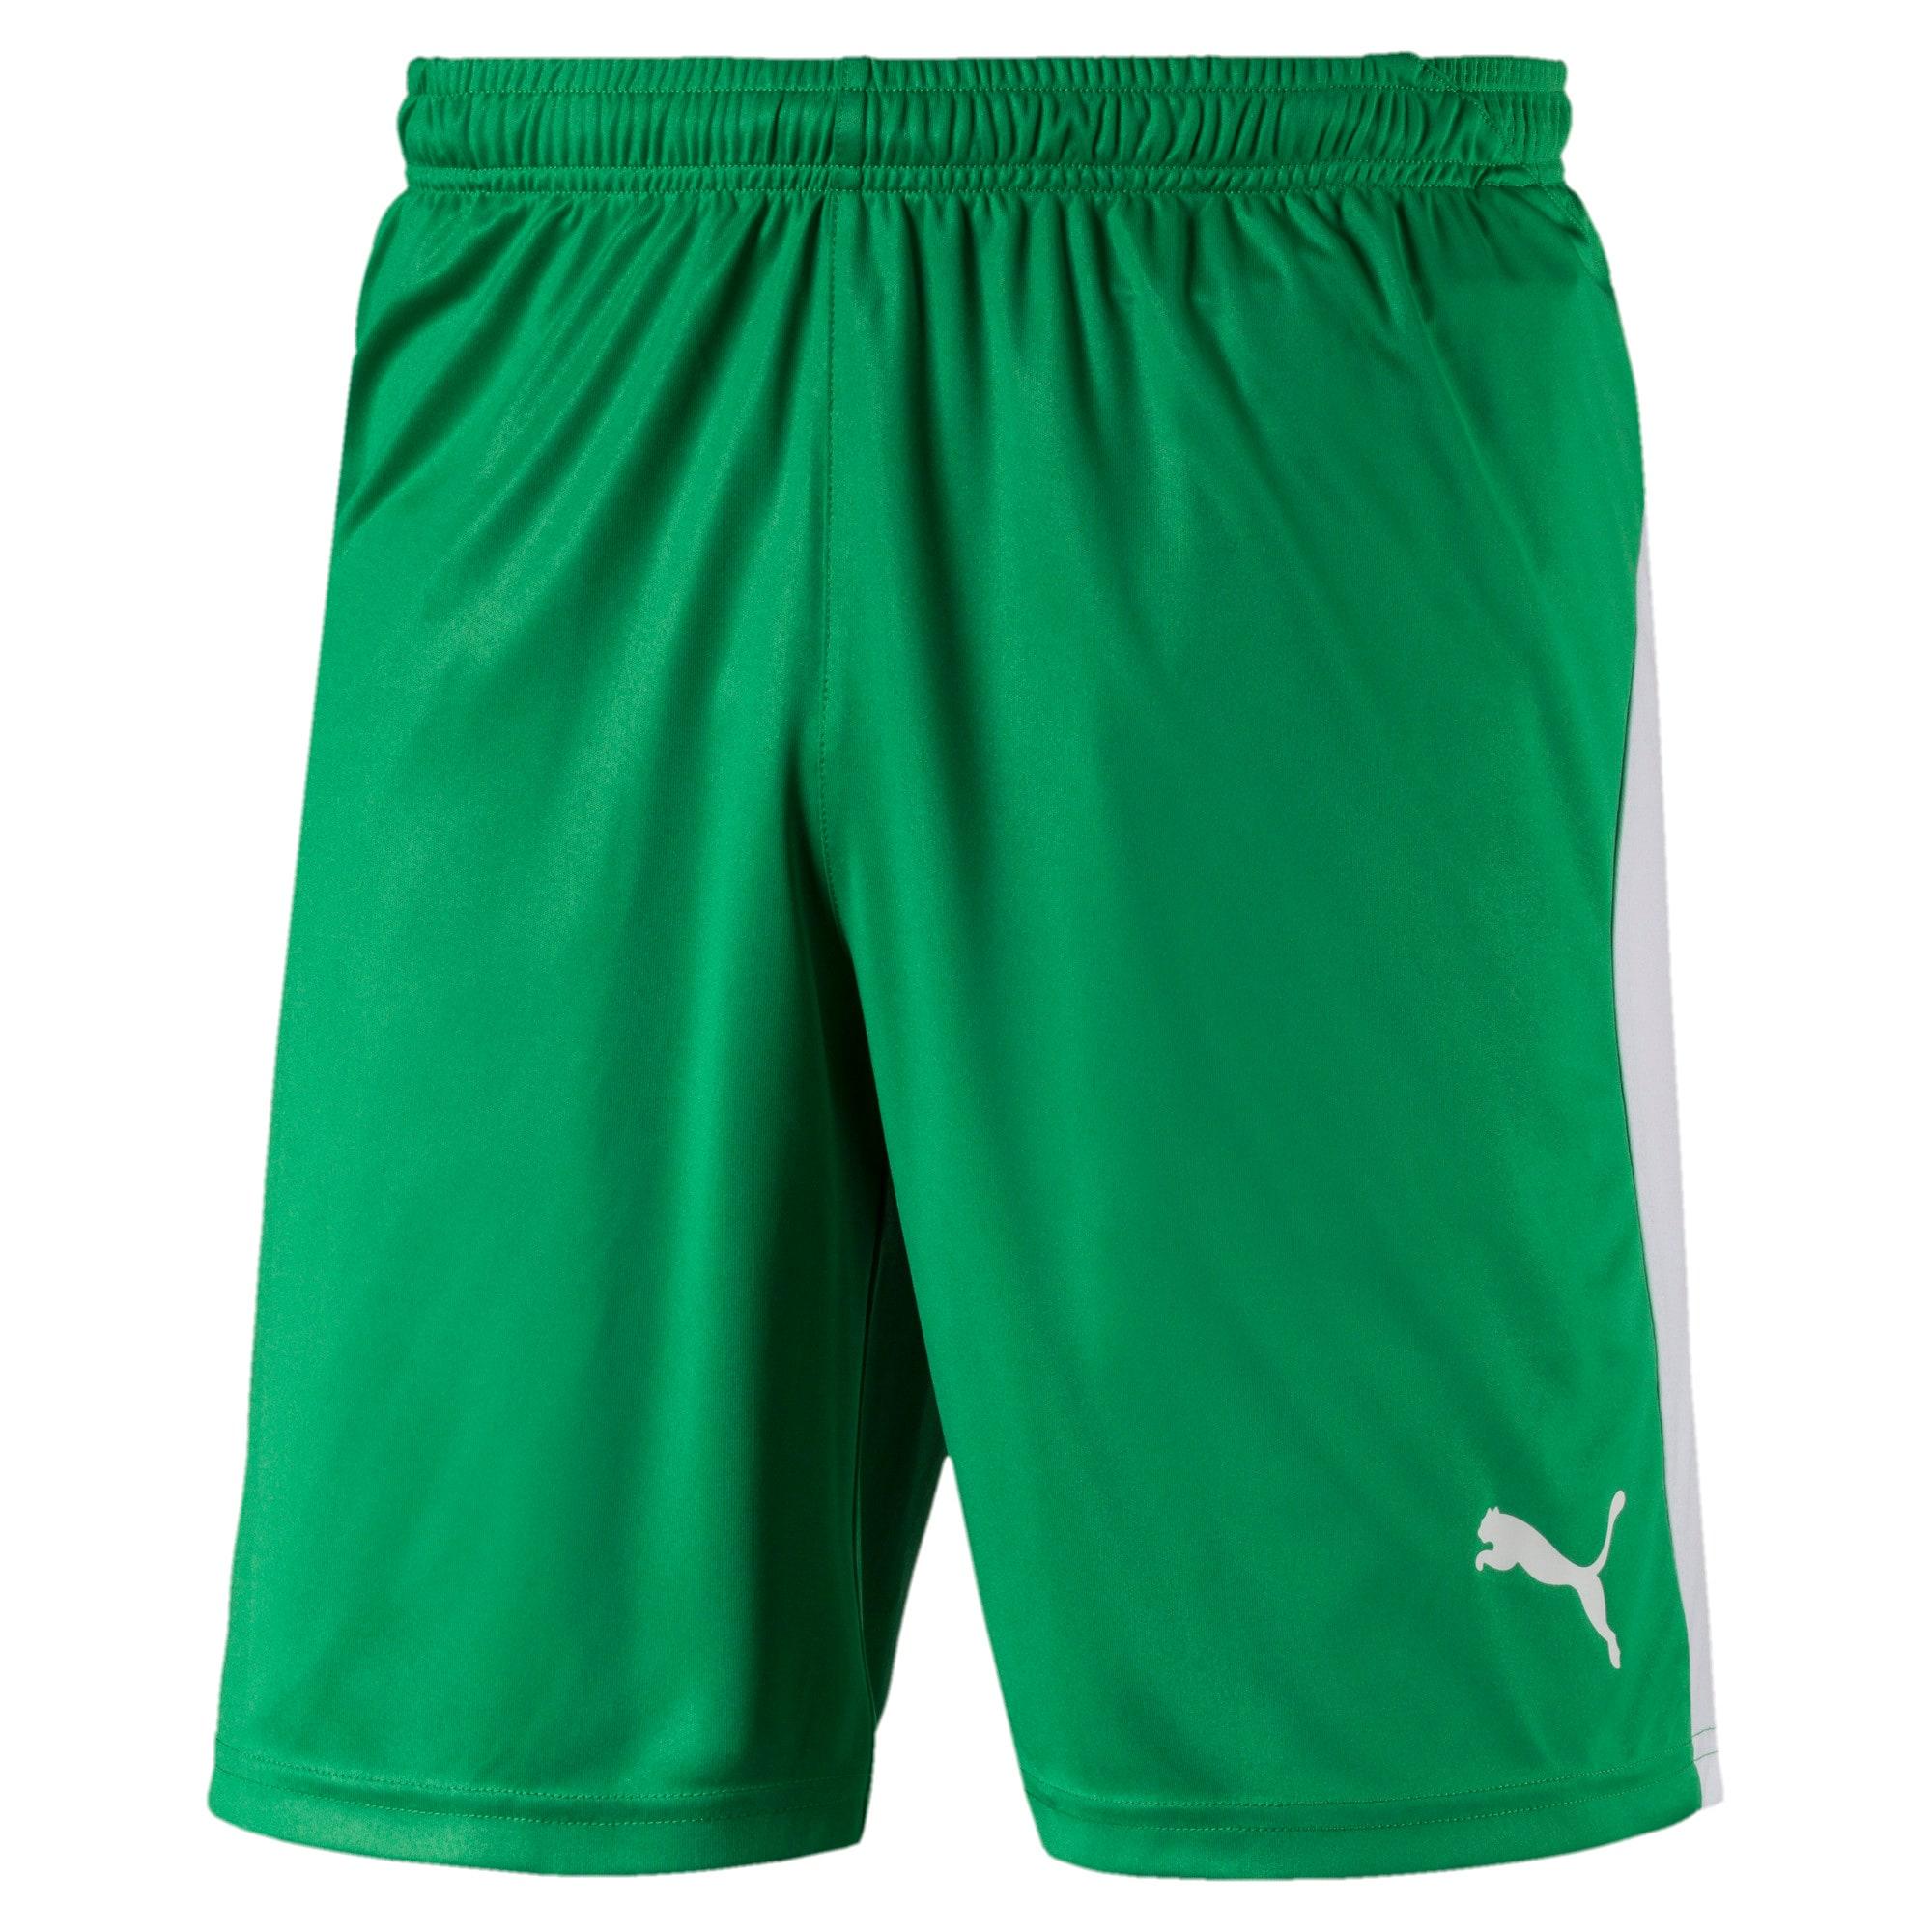 Thumbnail 1 of Liga Men's Shorts, Bright Green-Puma White, medium